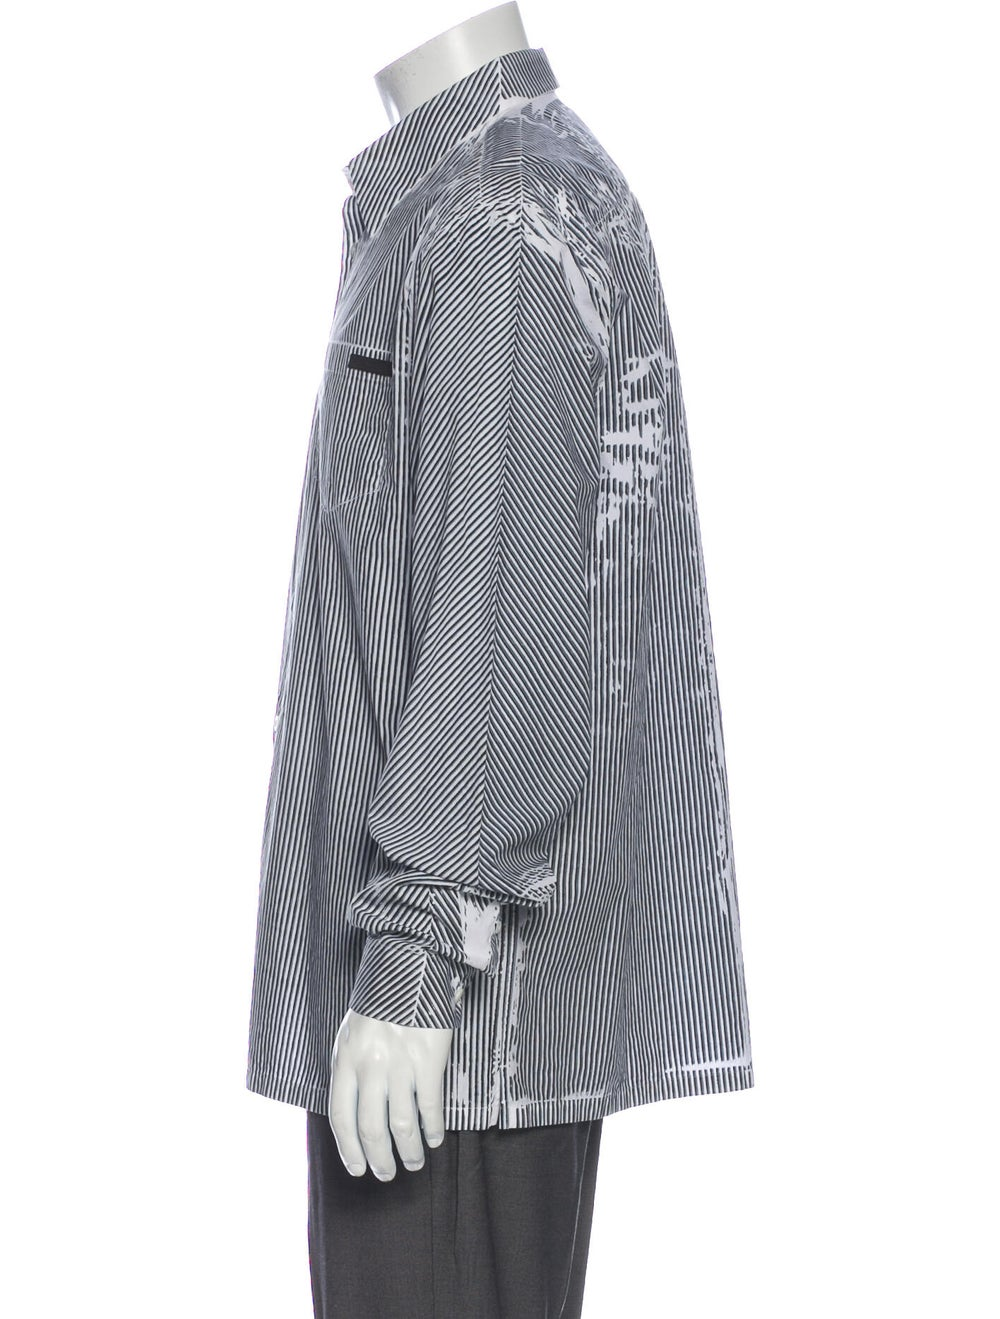 Prada 2019 Striped Dress Shirt Black - image 2